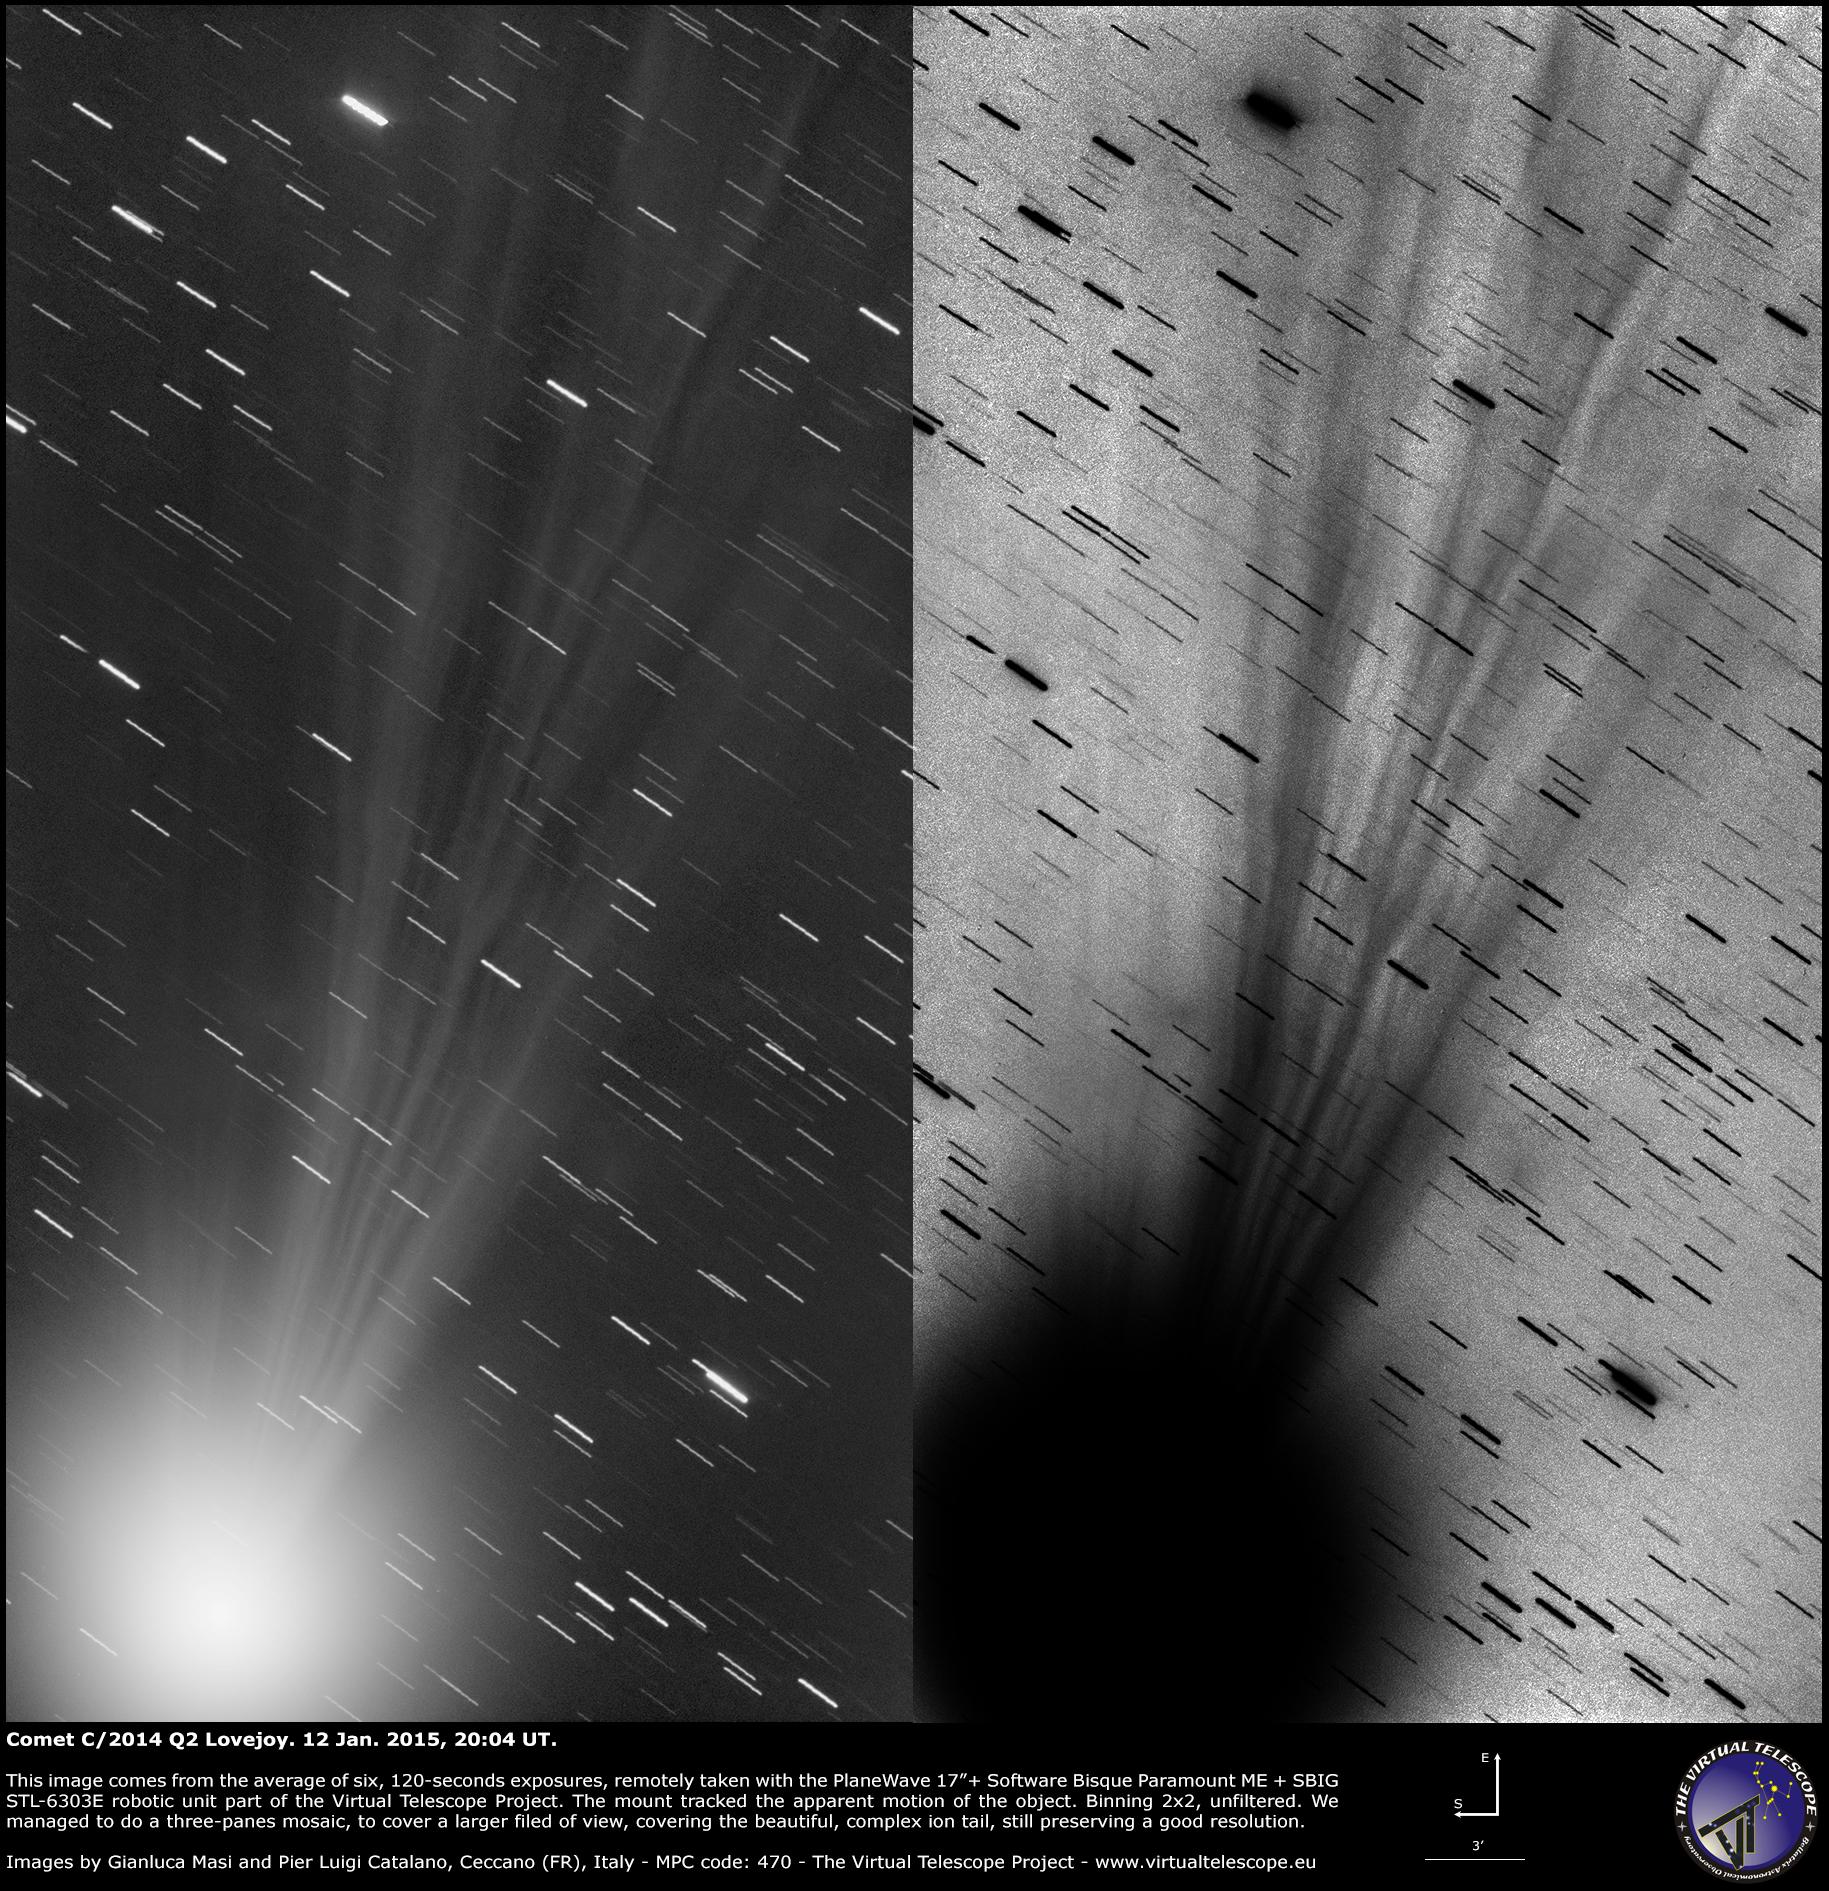 comet 2014 full movie online